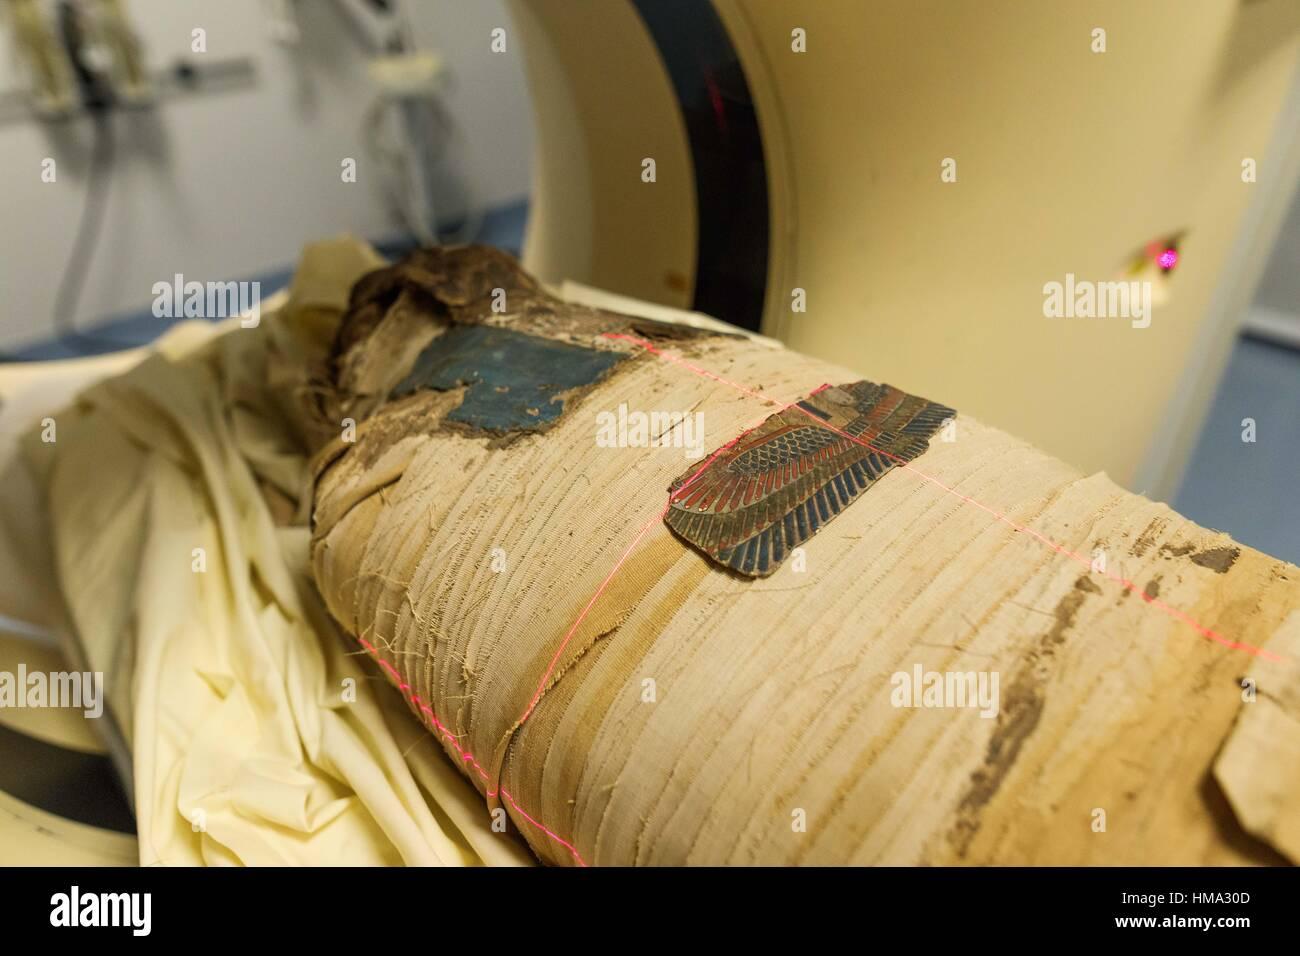 Hildesheim Germany 1st Feb 2017 An Egyptian Mummy Of The Stock